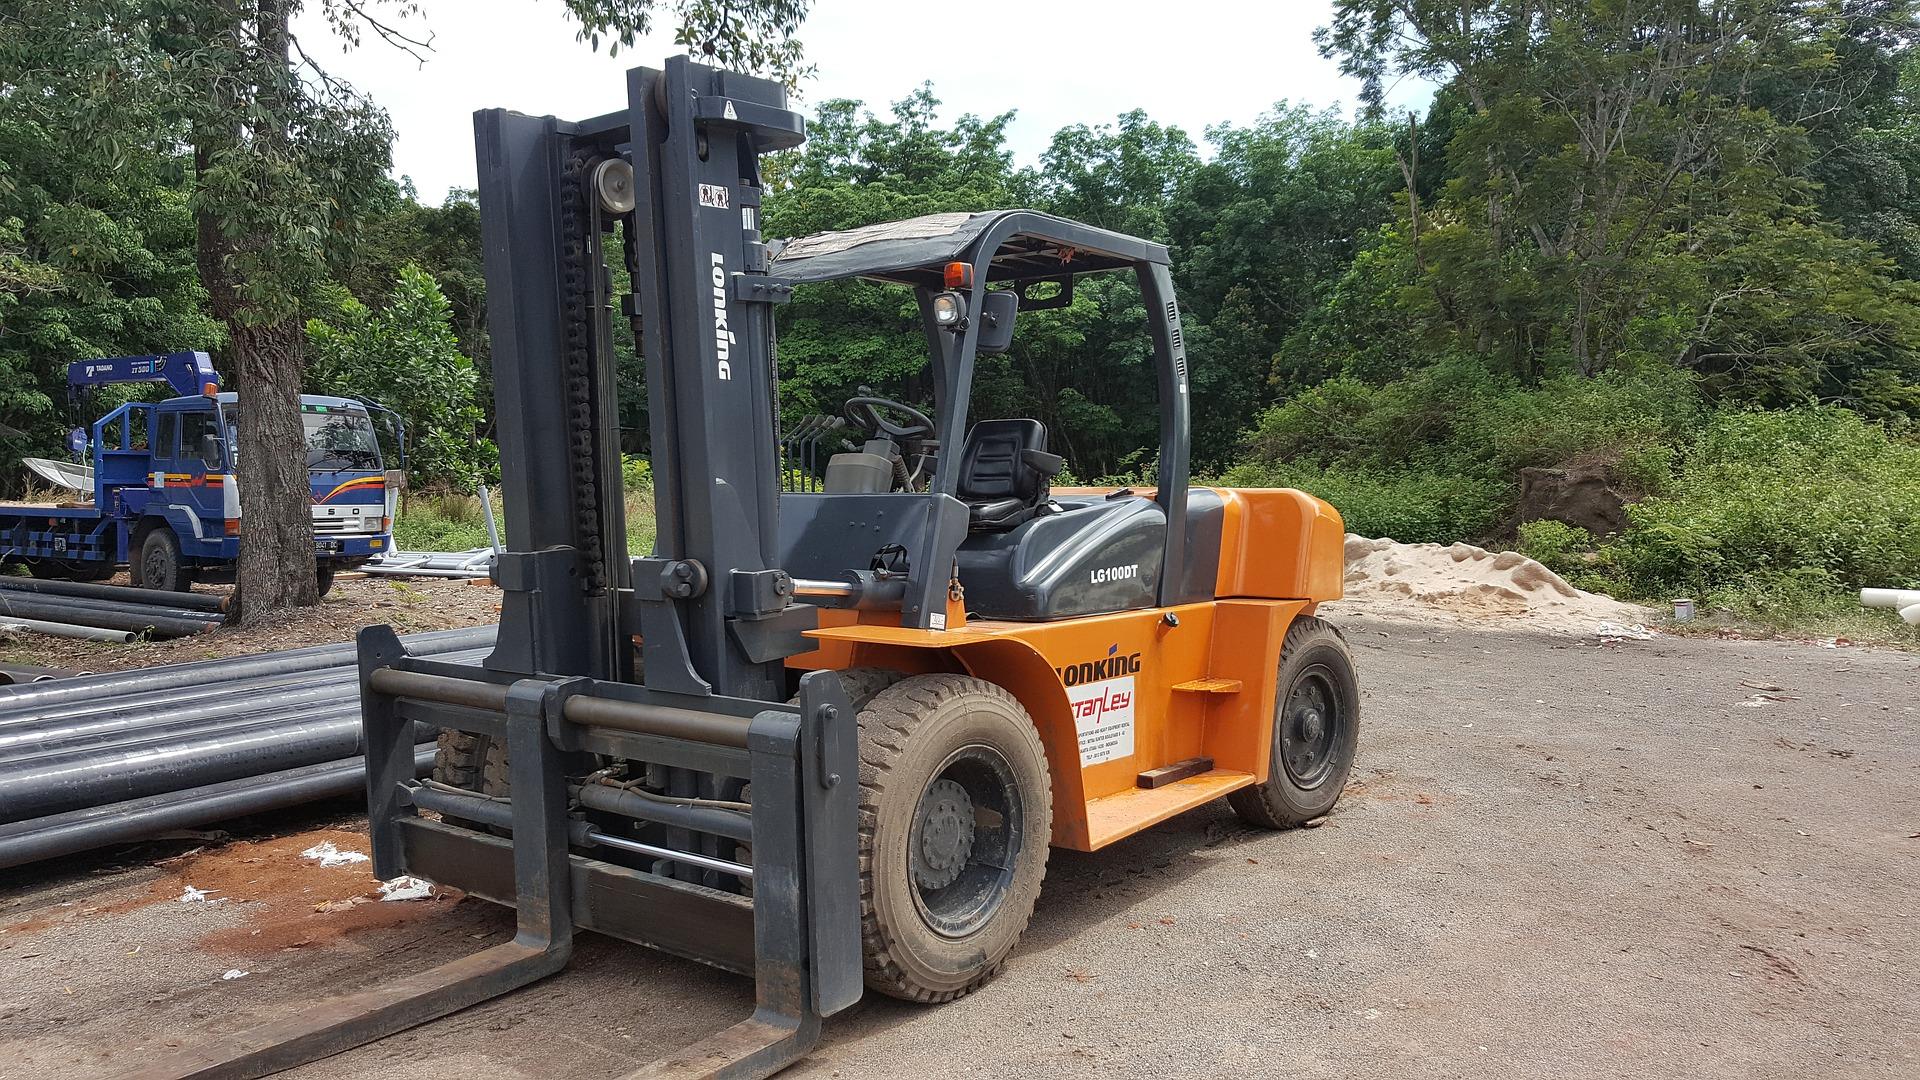 OSHA Forklift Safety Tools -